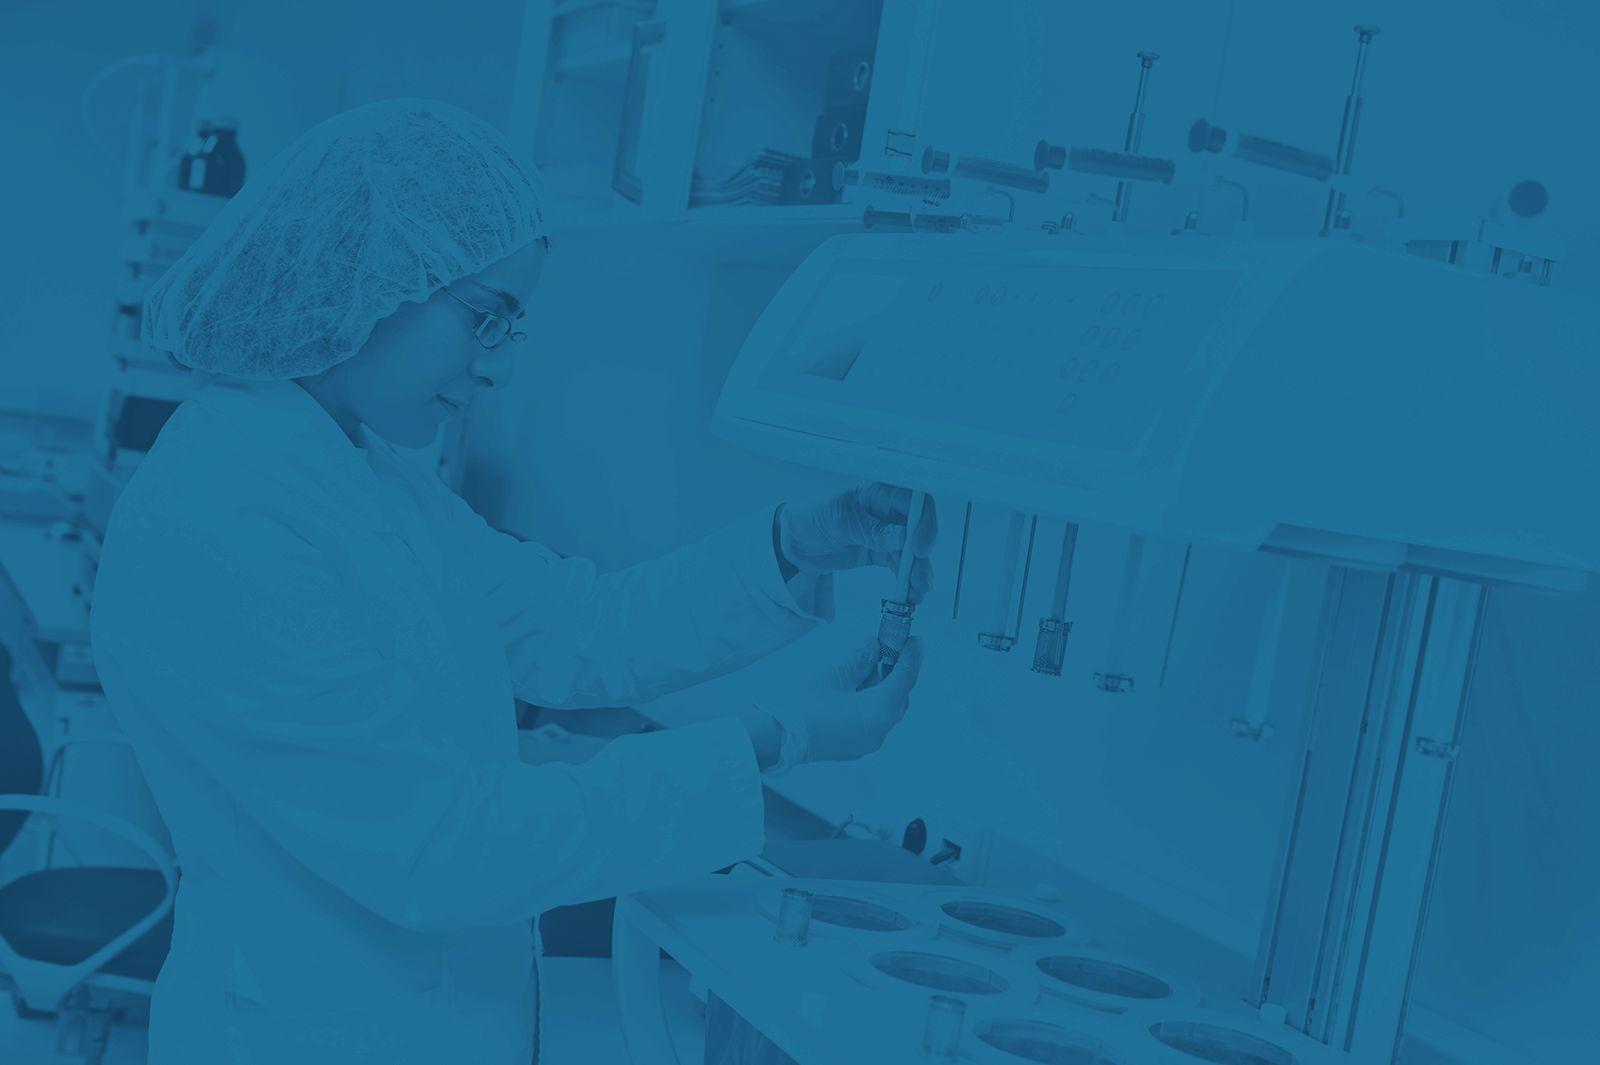 LabKey Biologics - Accelerating Large Molecule Development